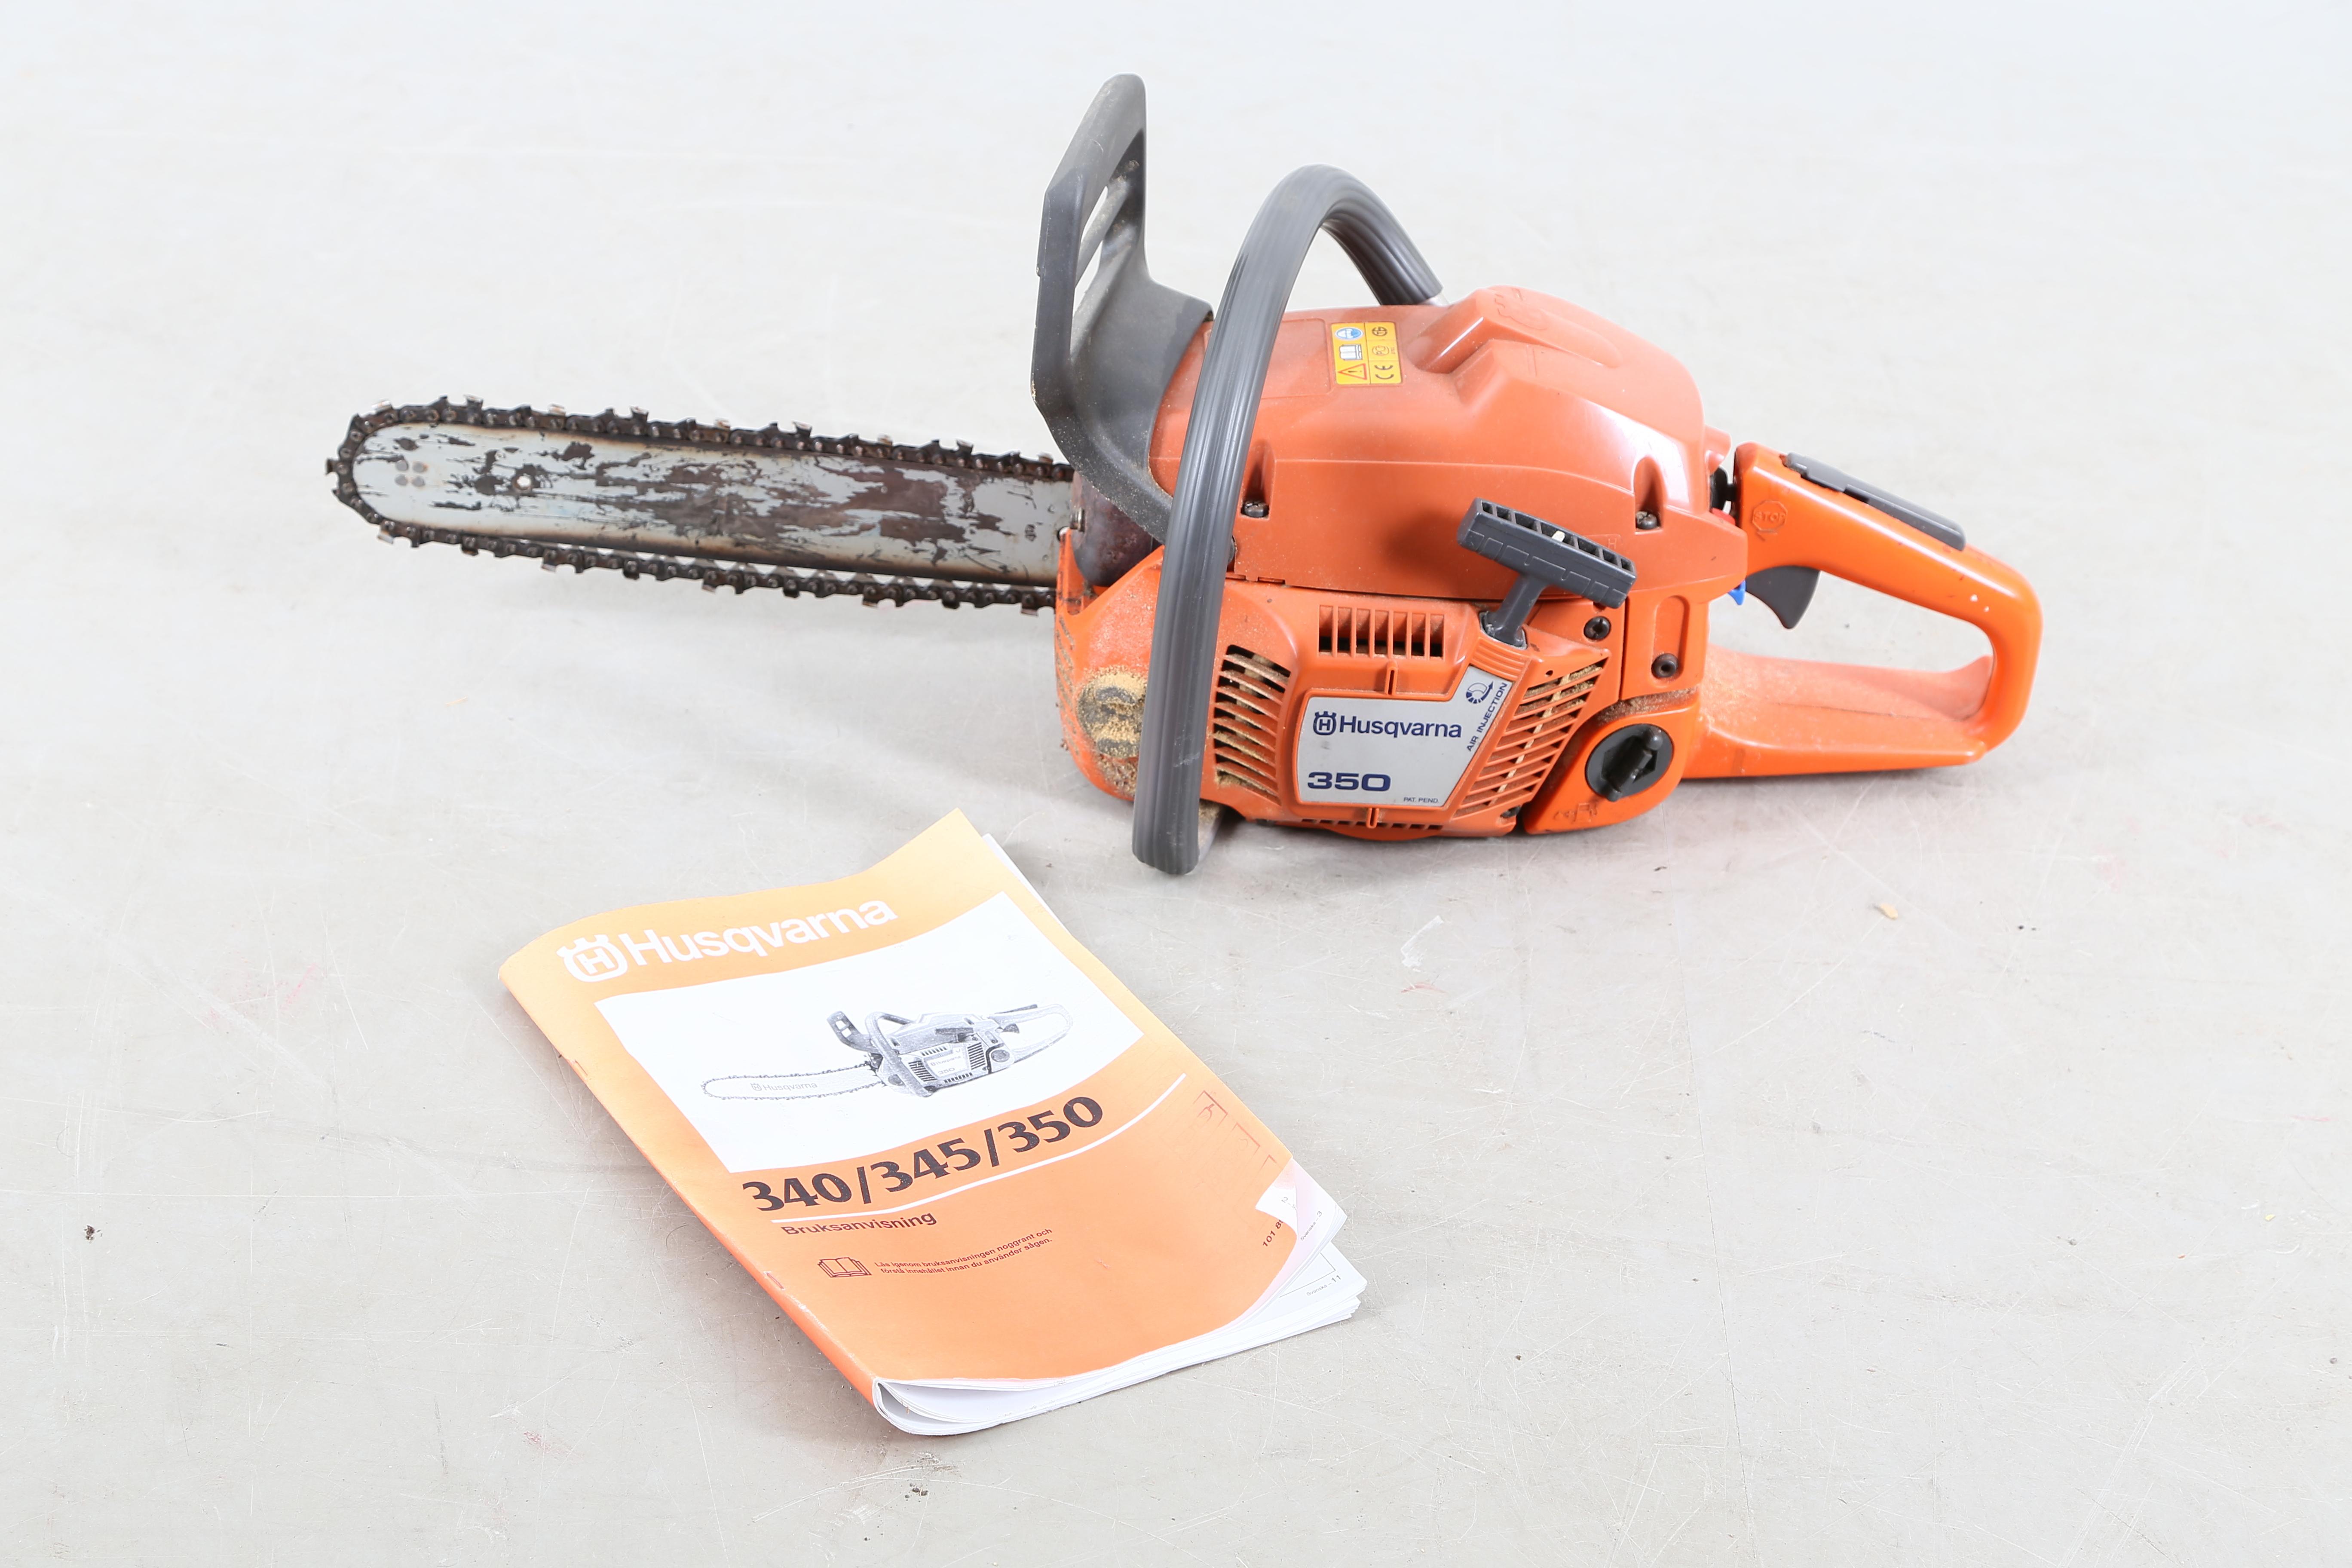 MOTORSÅG Husqvarna 350  Other - Modern Tools - Auctionet